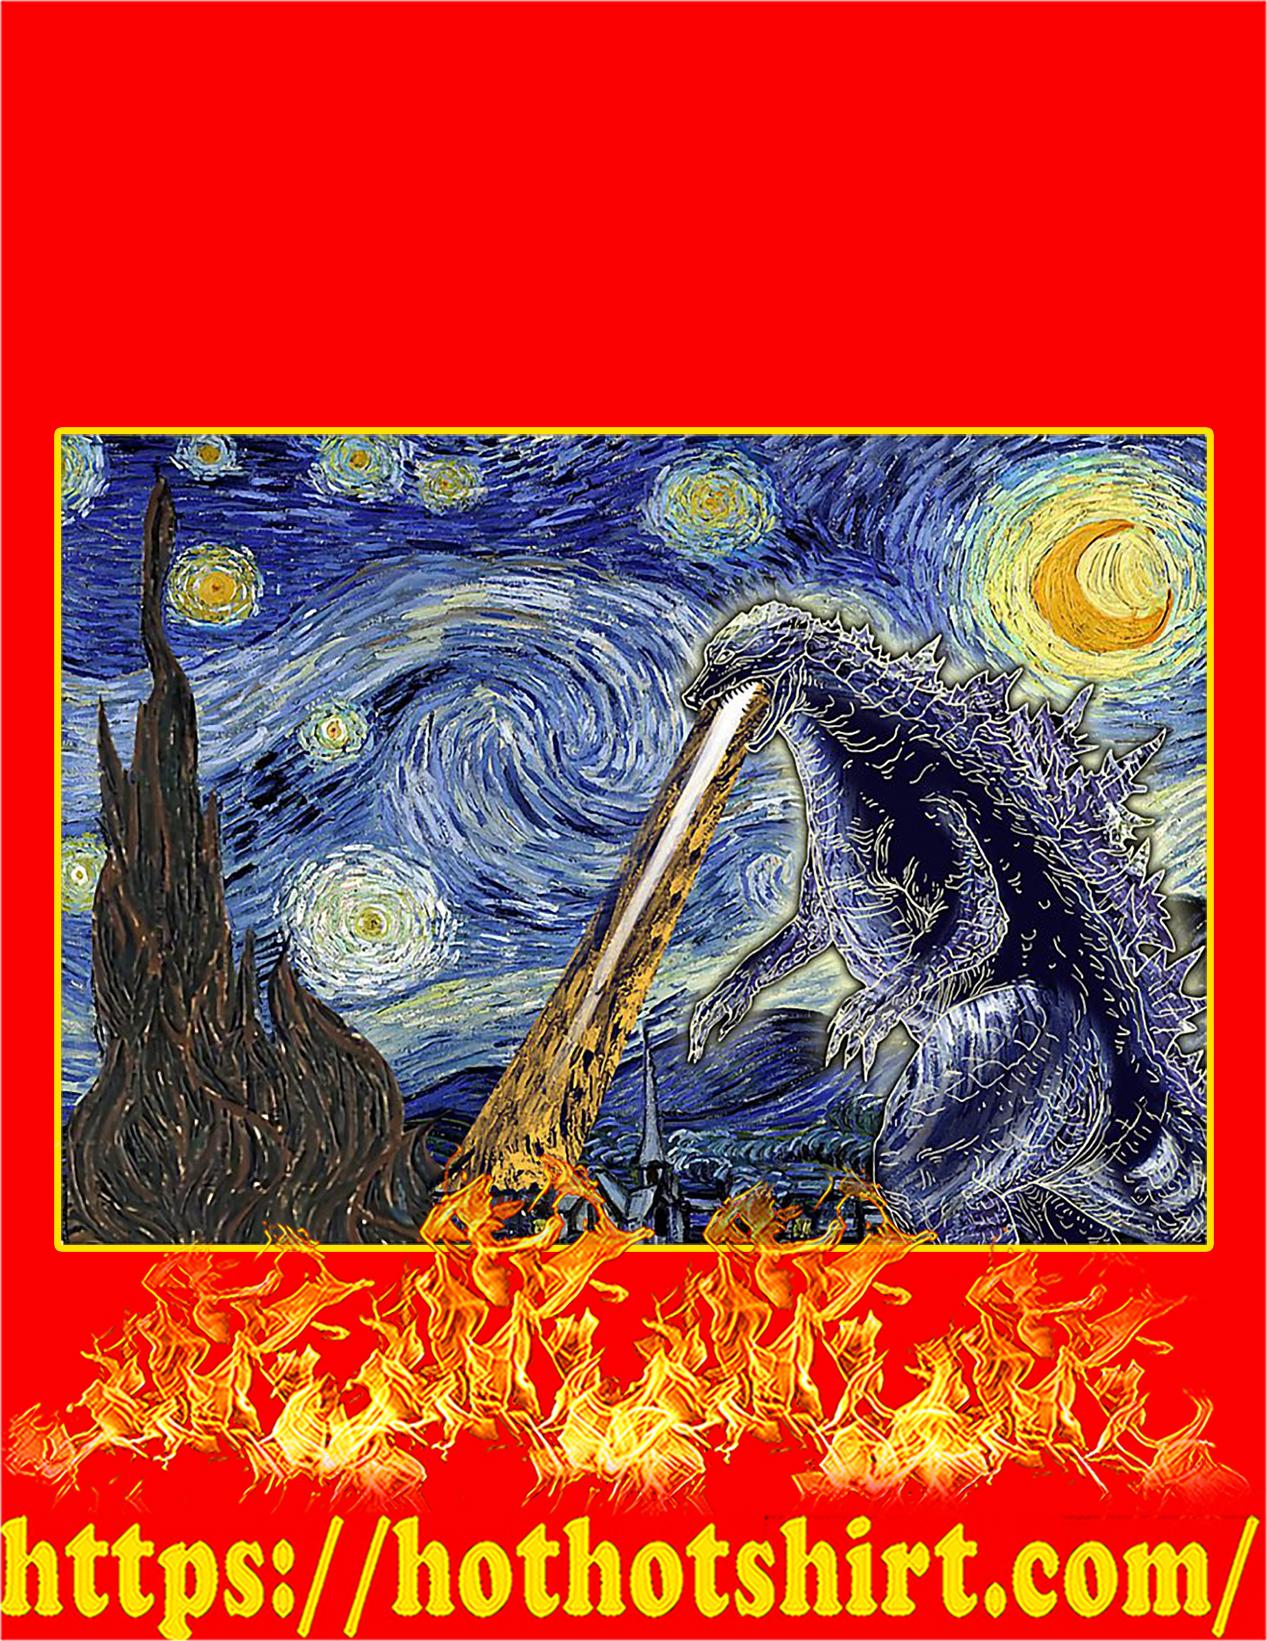 Godzilla starry night Van gogh poster - A4